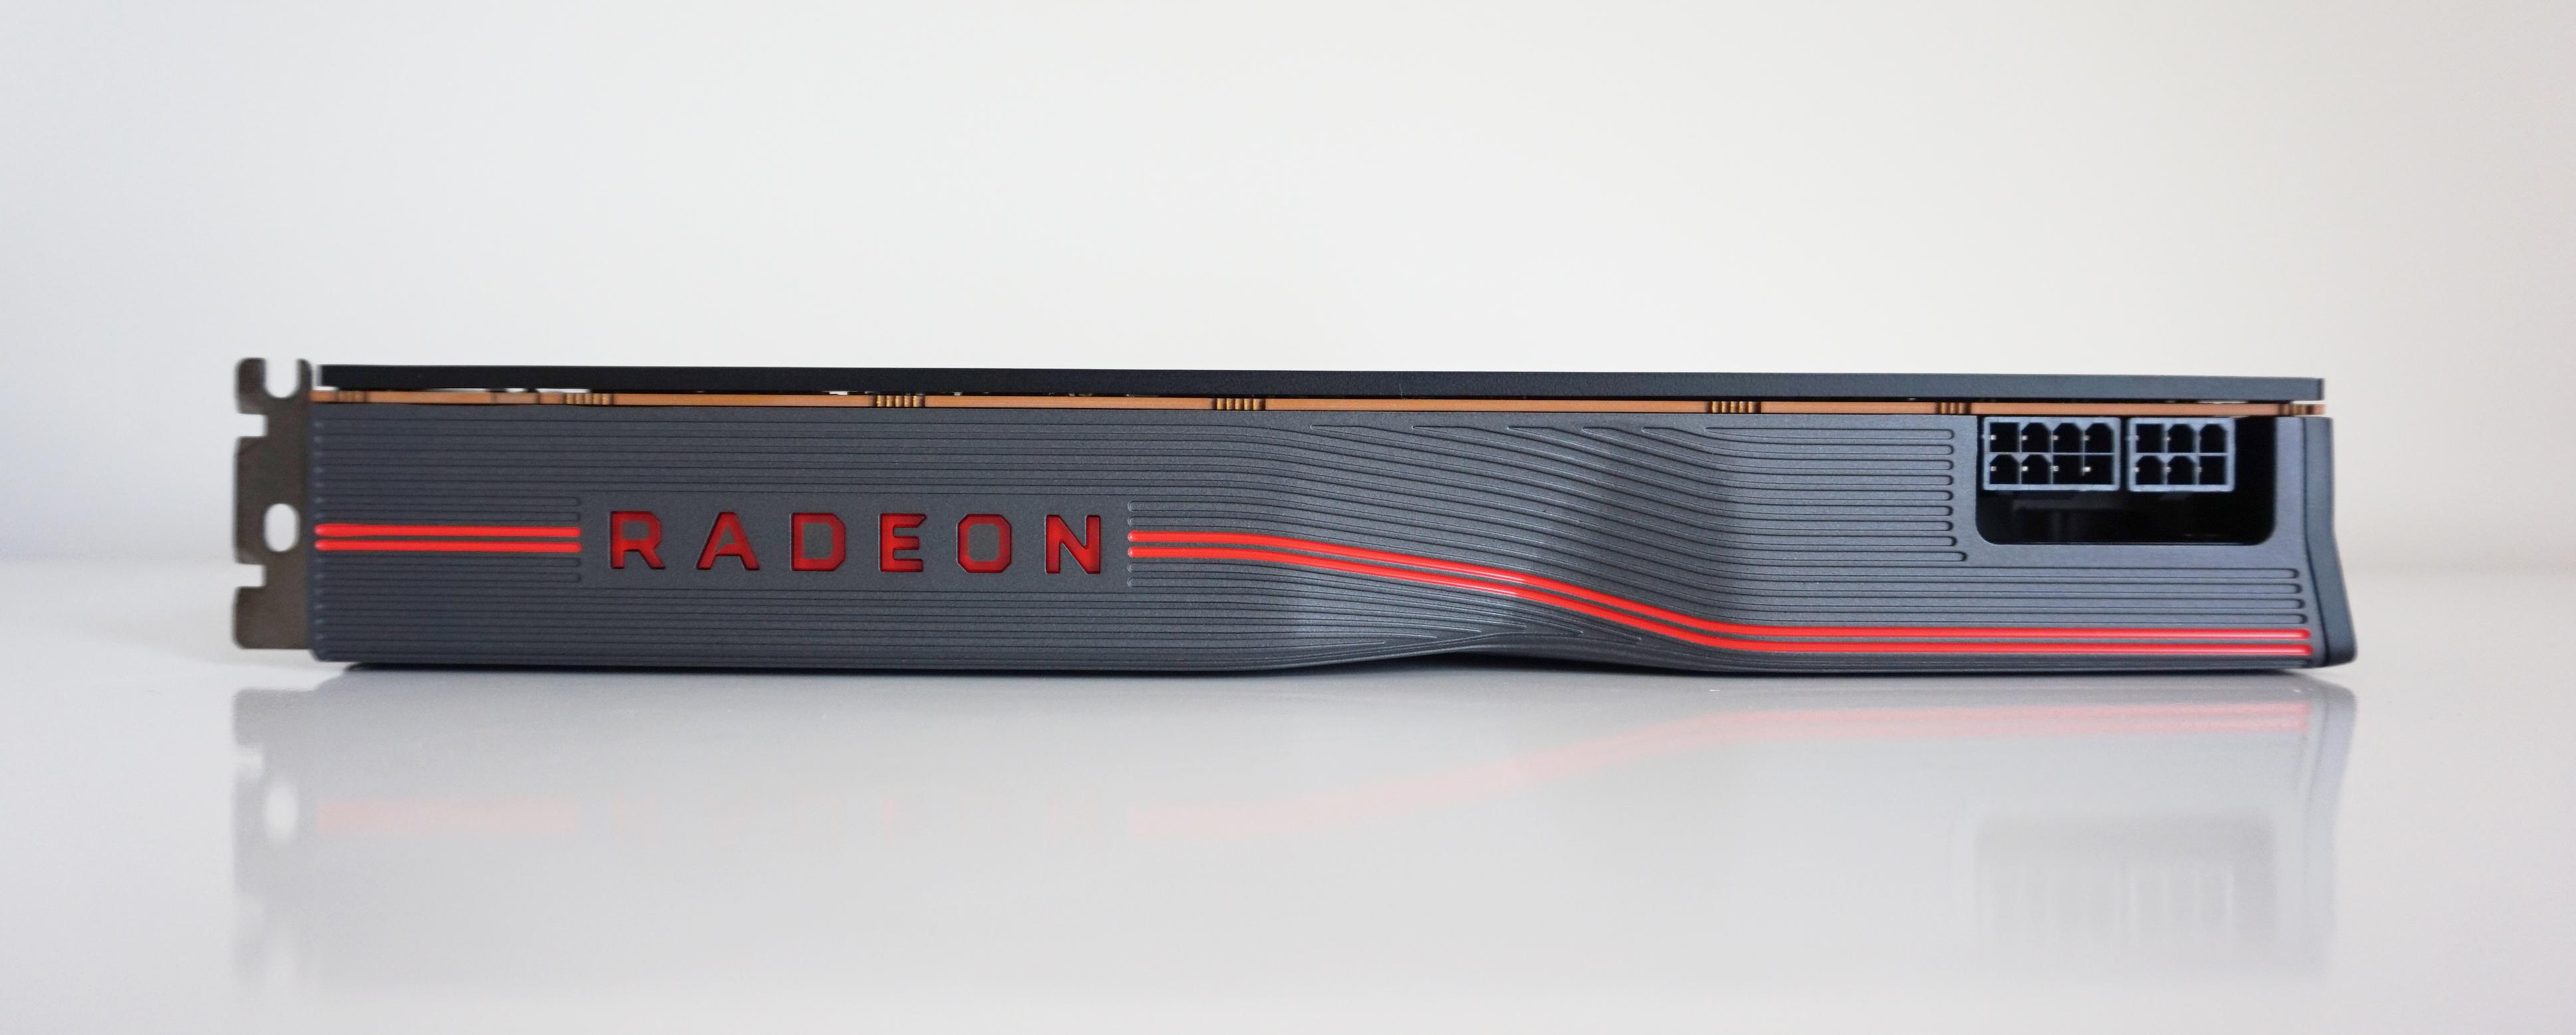 AMD Radeon RX 5700 XT review | Rock Paper Shotgun